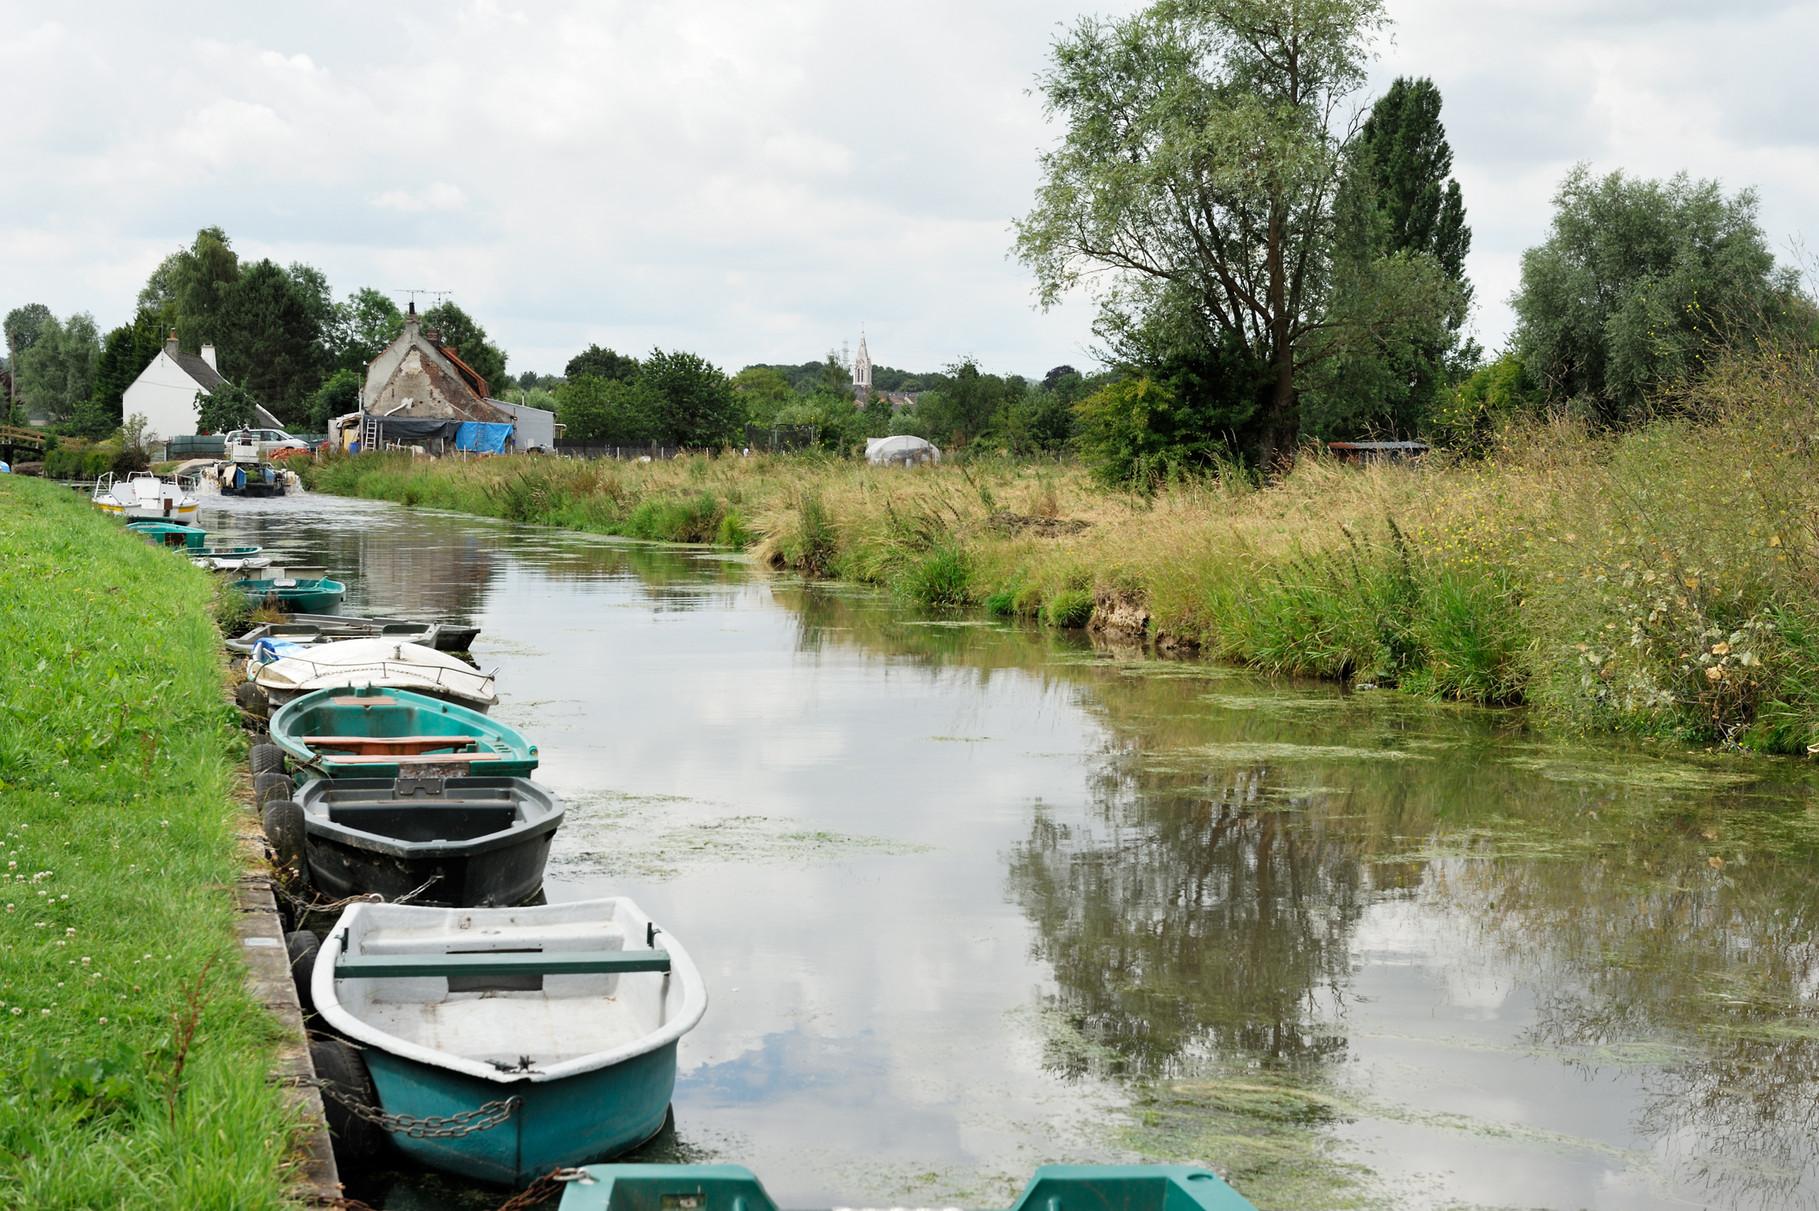 Saint-Martin-Laert, Marais Audomarois par Richard Soberka